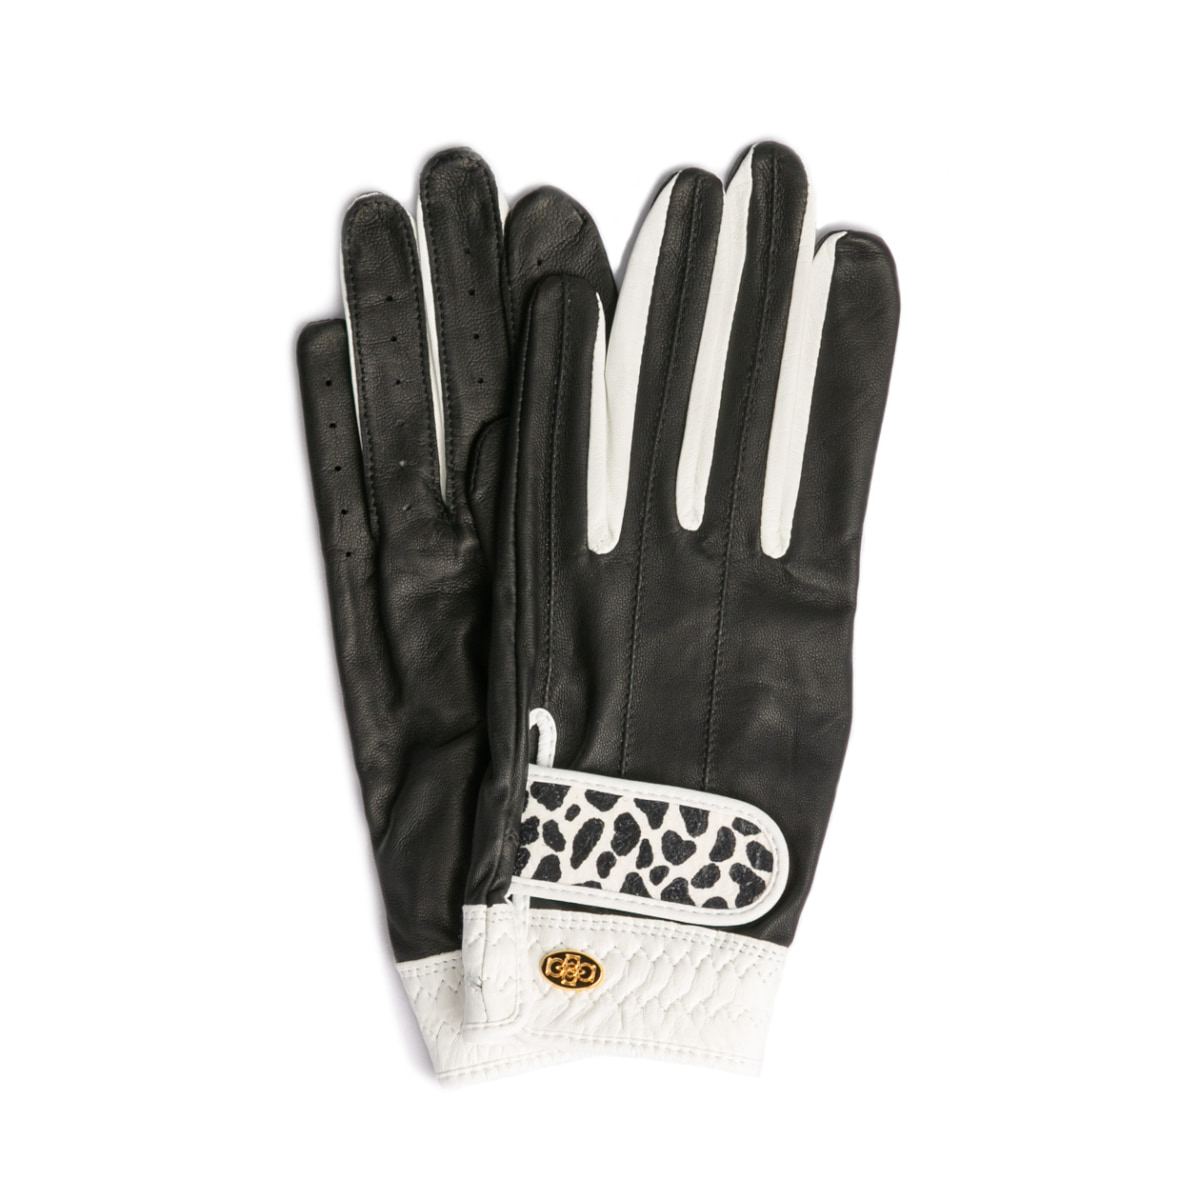 Elegant Golf Glove【両手】black-white-dalmatian